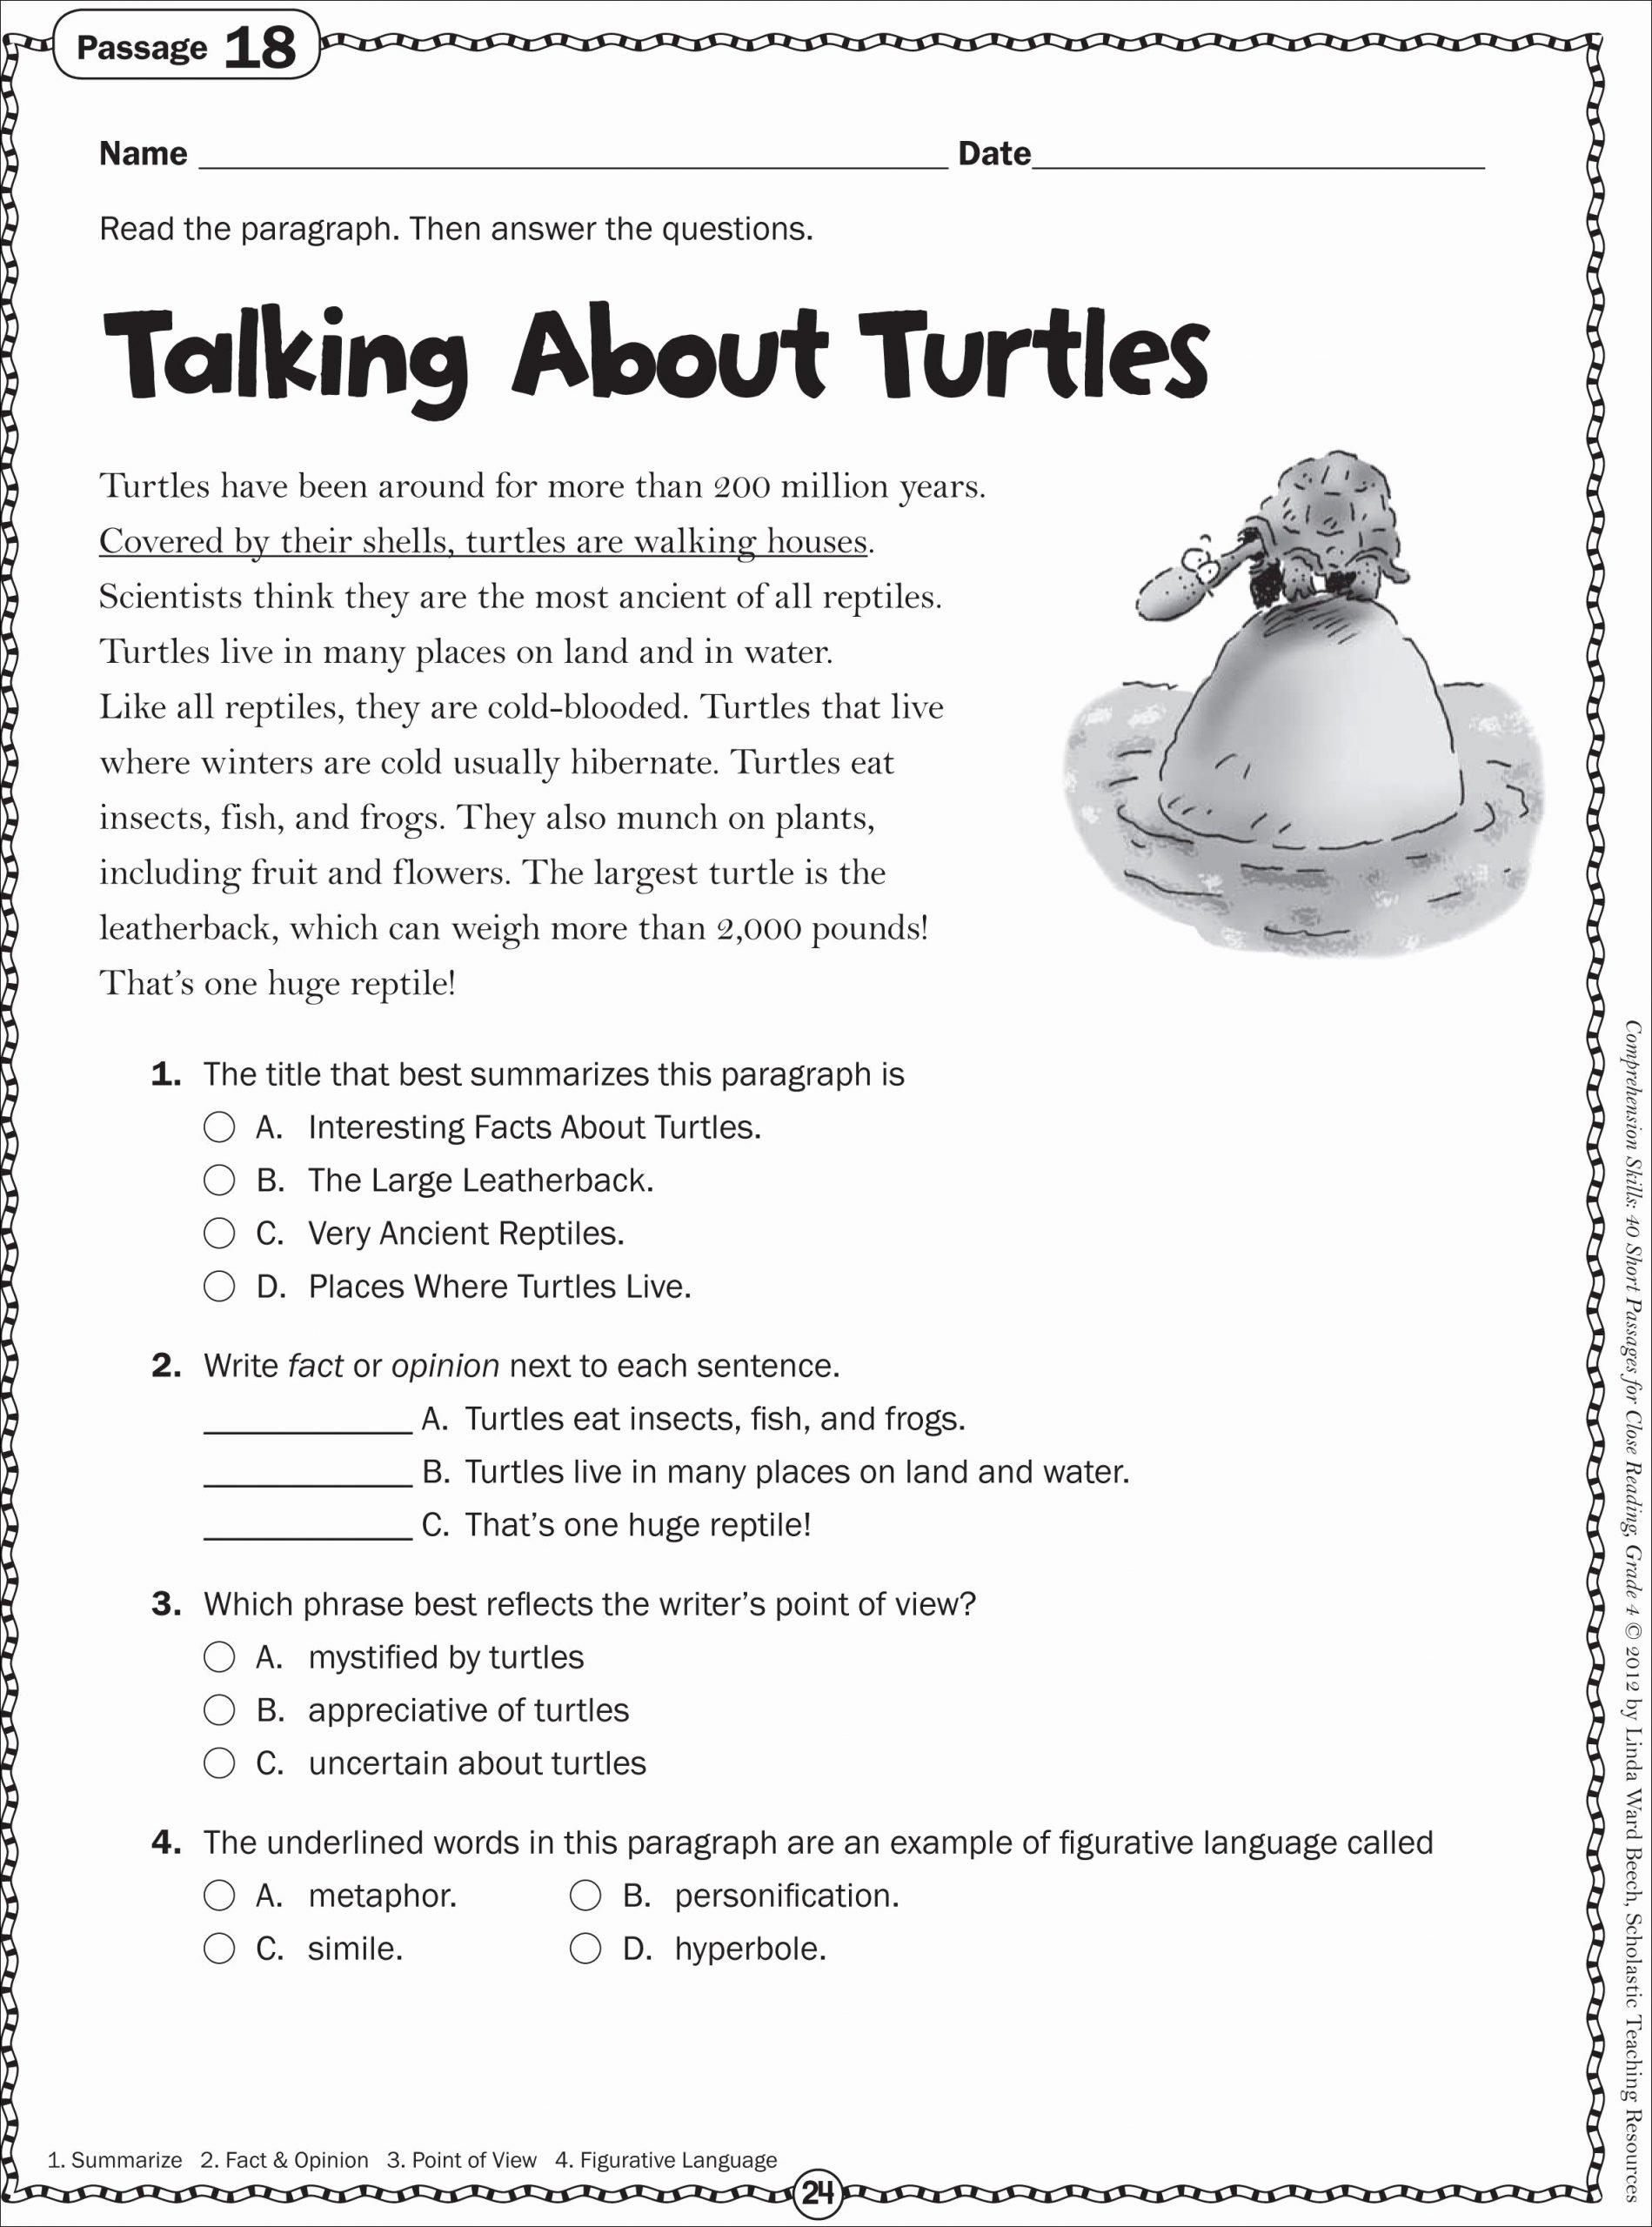 Reading Comprehension Worksheets 7th Grade Best Of Recent 7th Grade Language Arts Worksheets 7thgradeactscores